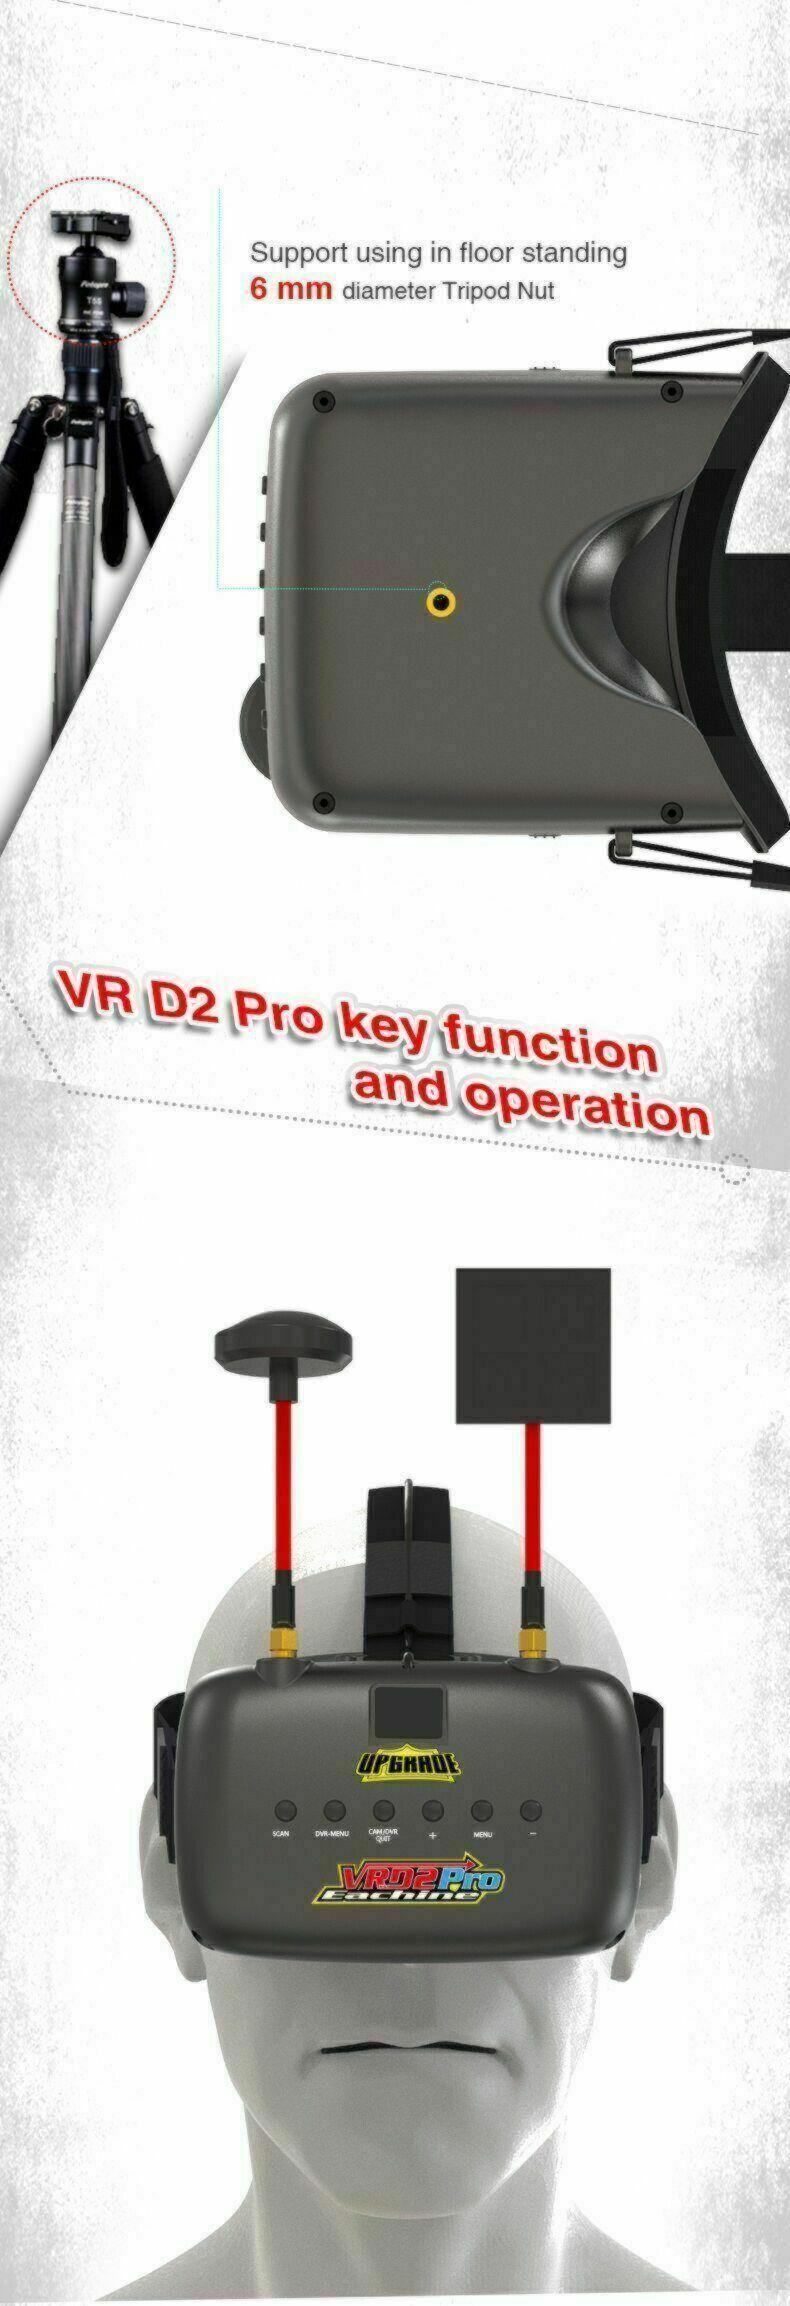 Eachine VRD2 PRO - FPV Video Goggles   Monitor /w Diversity RX